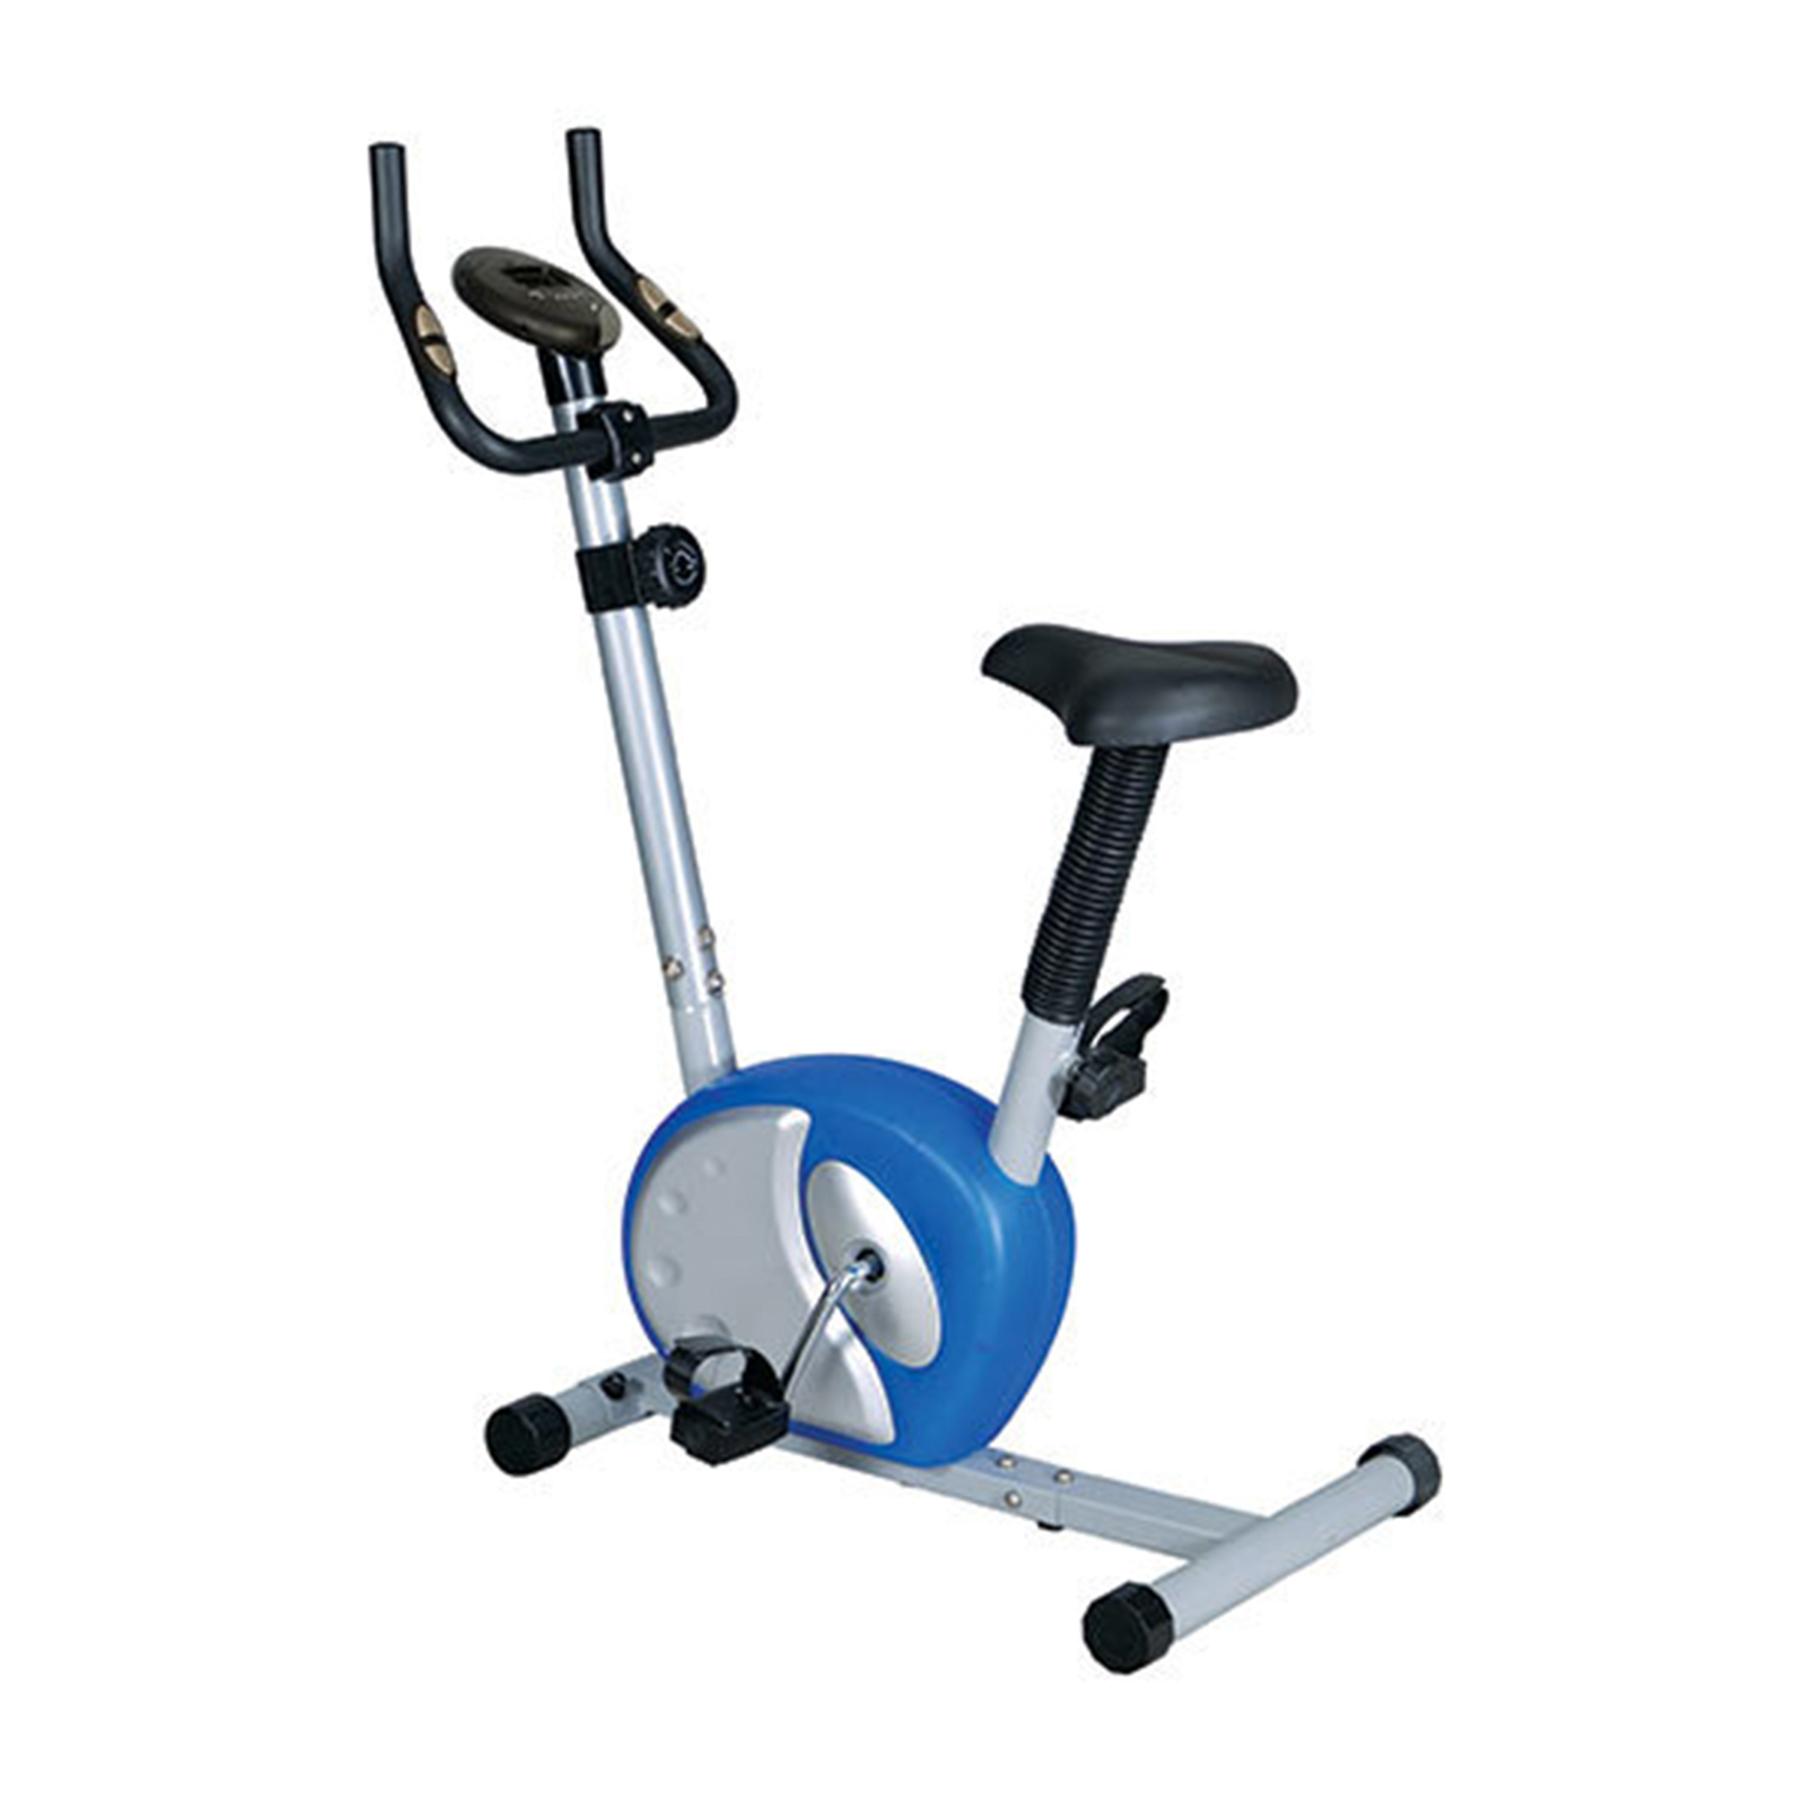 Велотренажер магнитный BC SE-200  маховик 4кг, макс.нагр. 100кг*